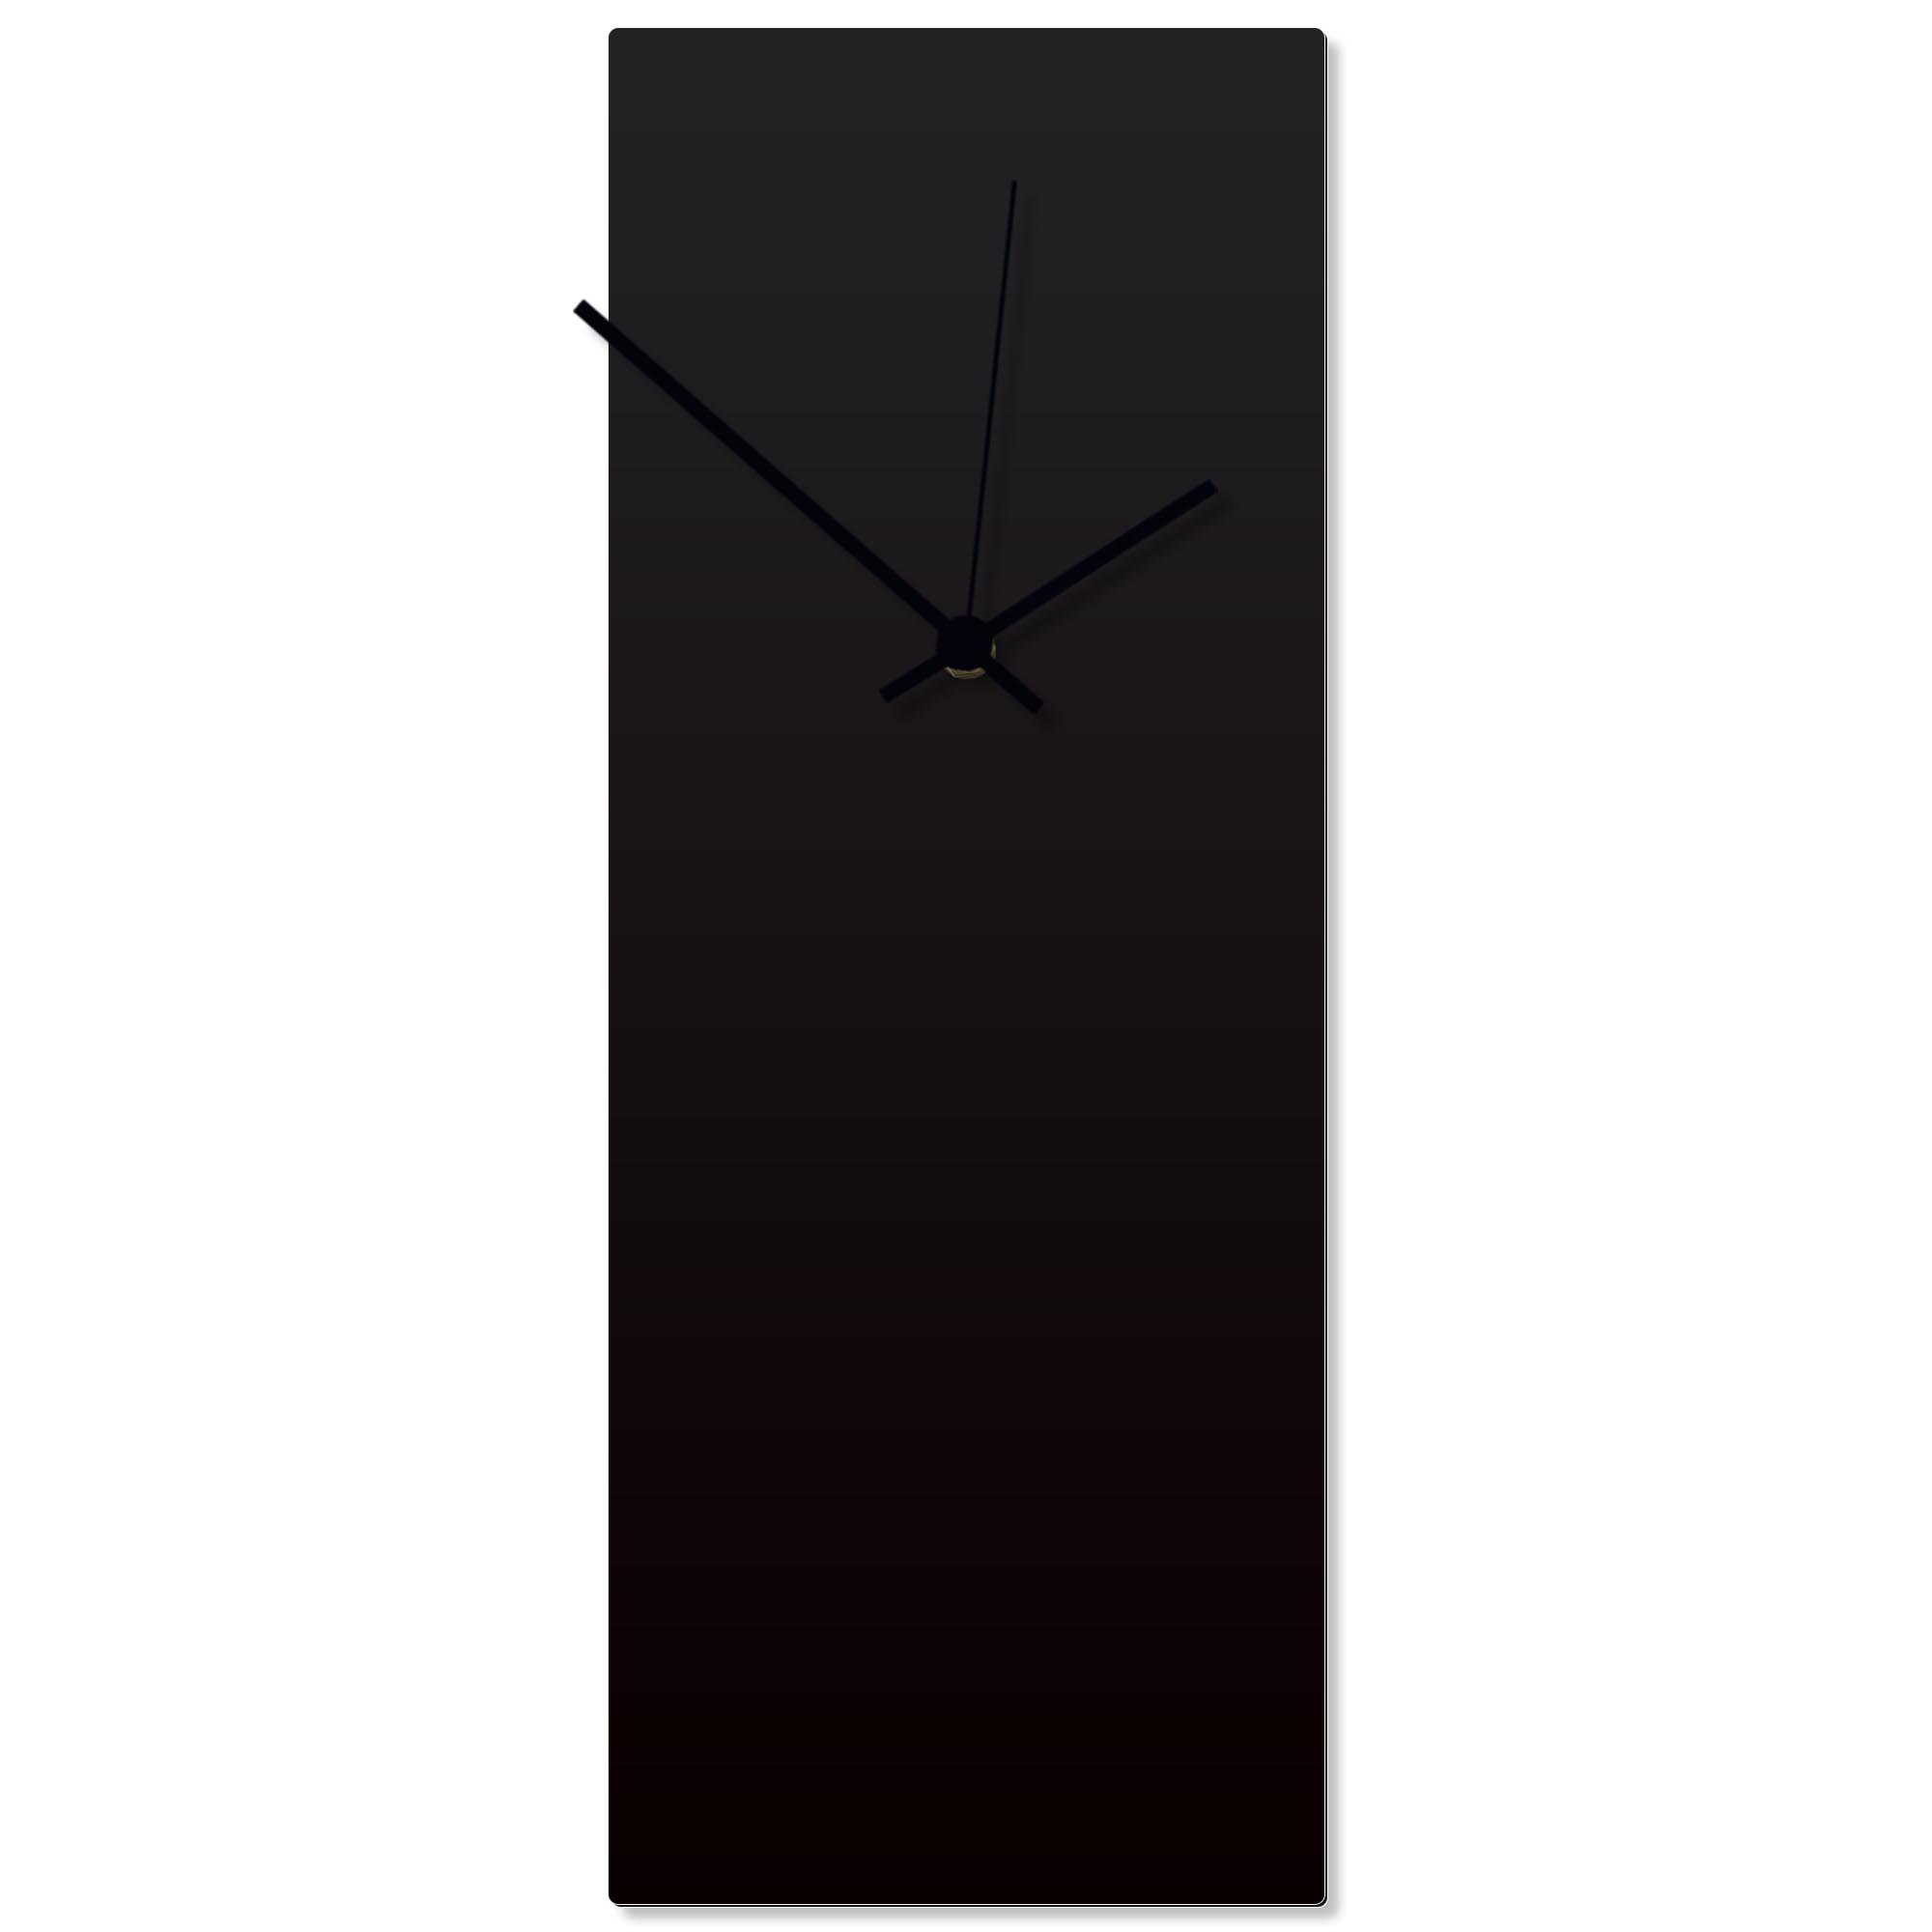 Blackout Black Clock Large 8.25x22in. Aluminum Polymetal